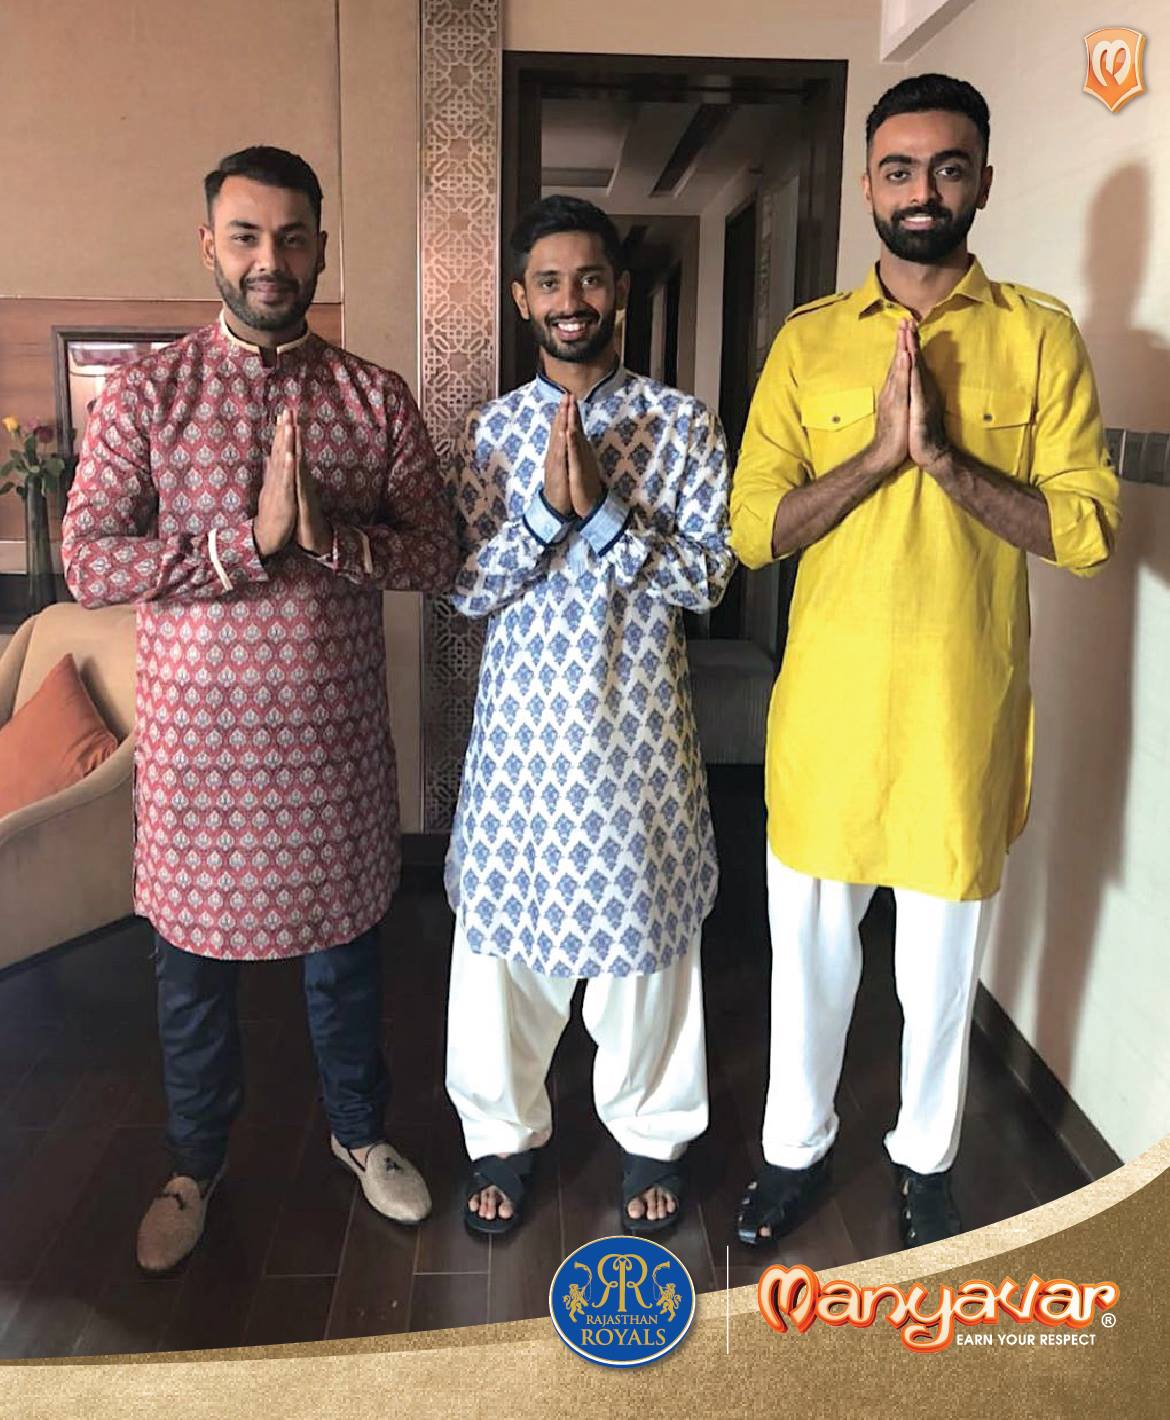 Rajasthan RoyalsOfficial Sponsors List Partners Brand Ambassador Logos On Jerseys Manyavar